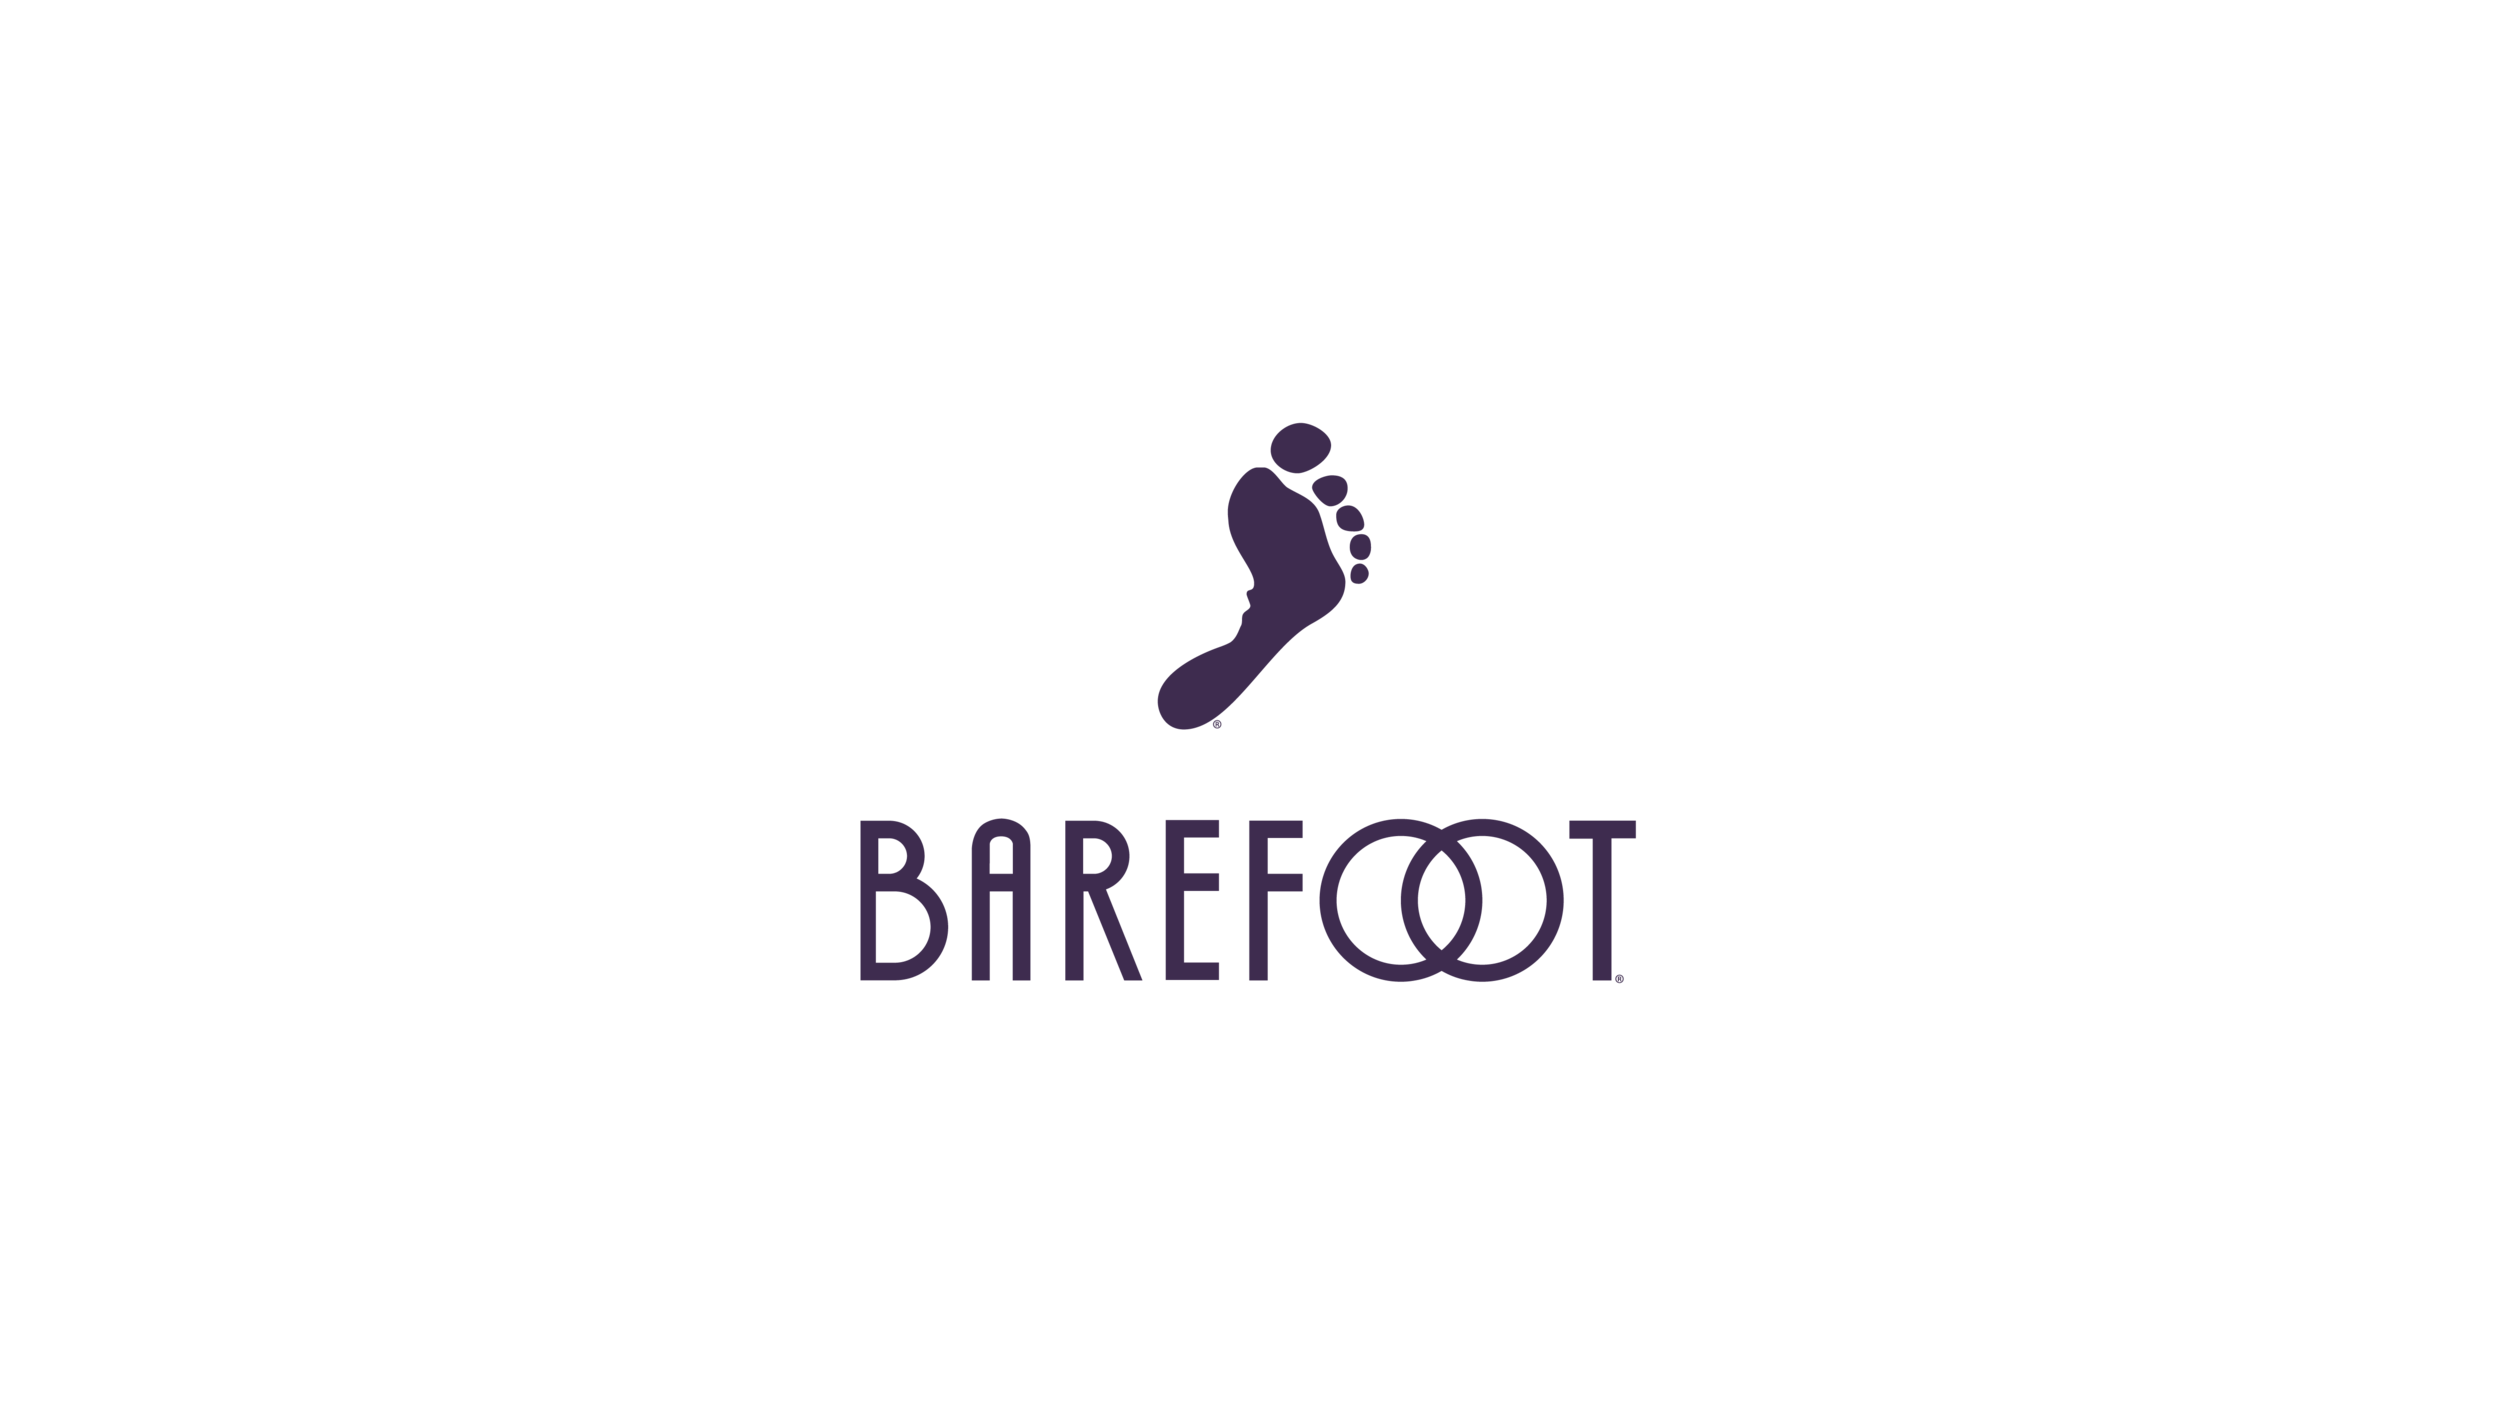 logo_new 14sept2017 vertical.png